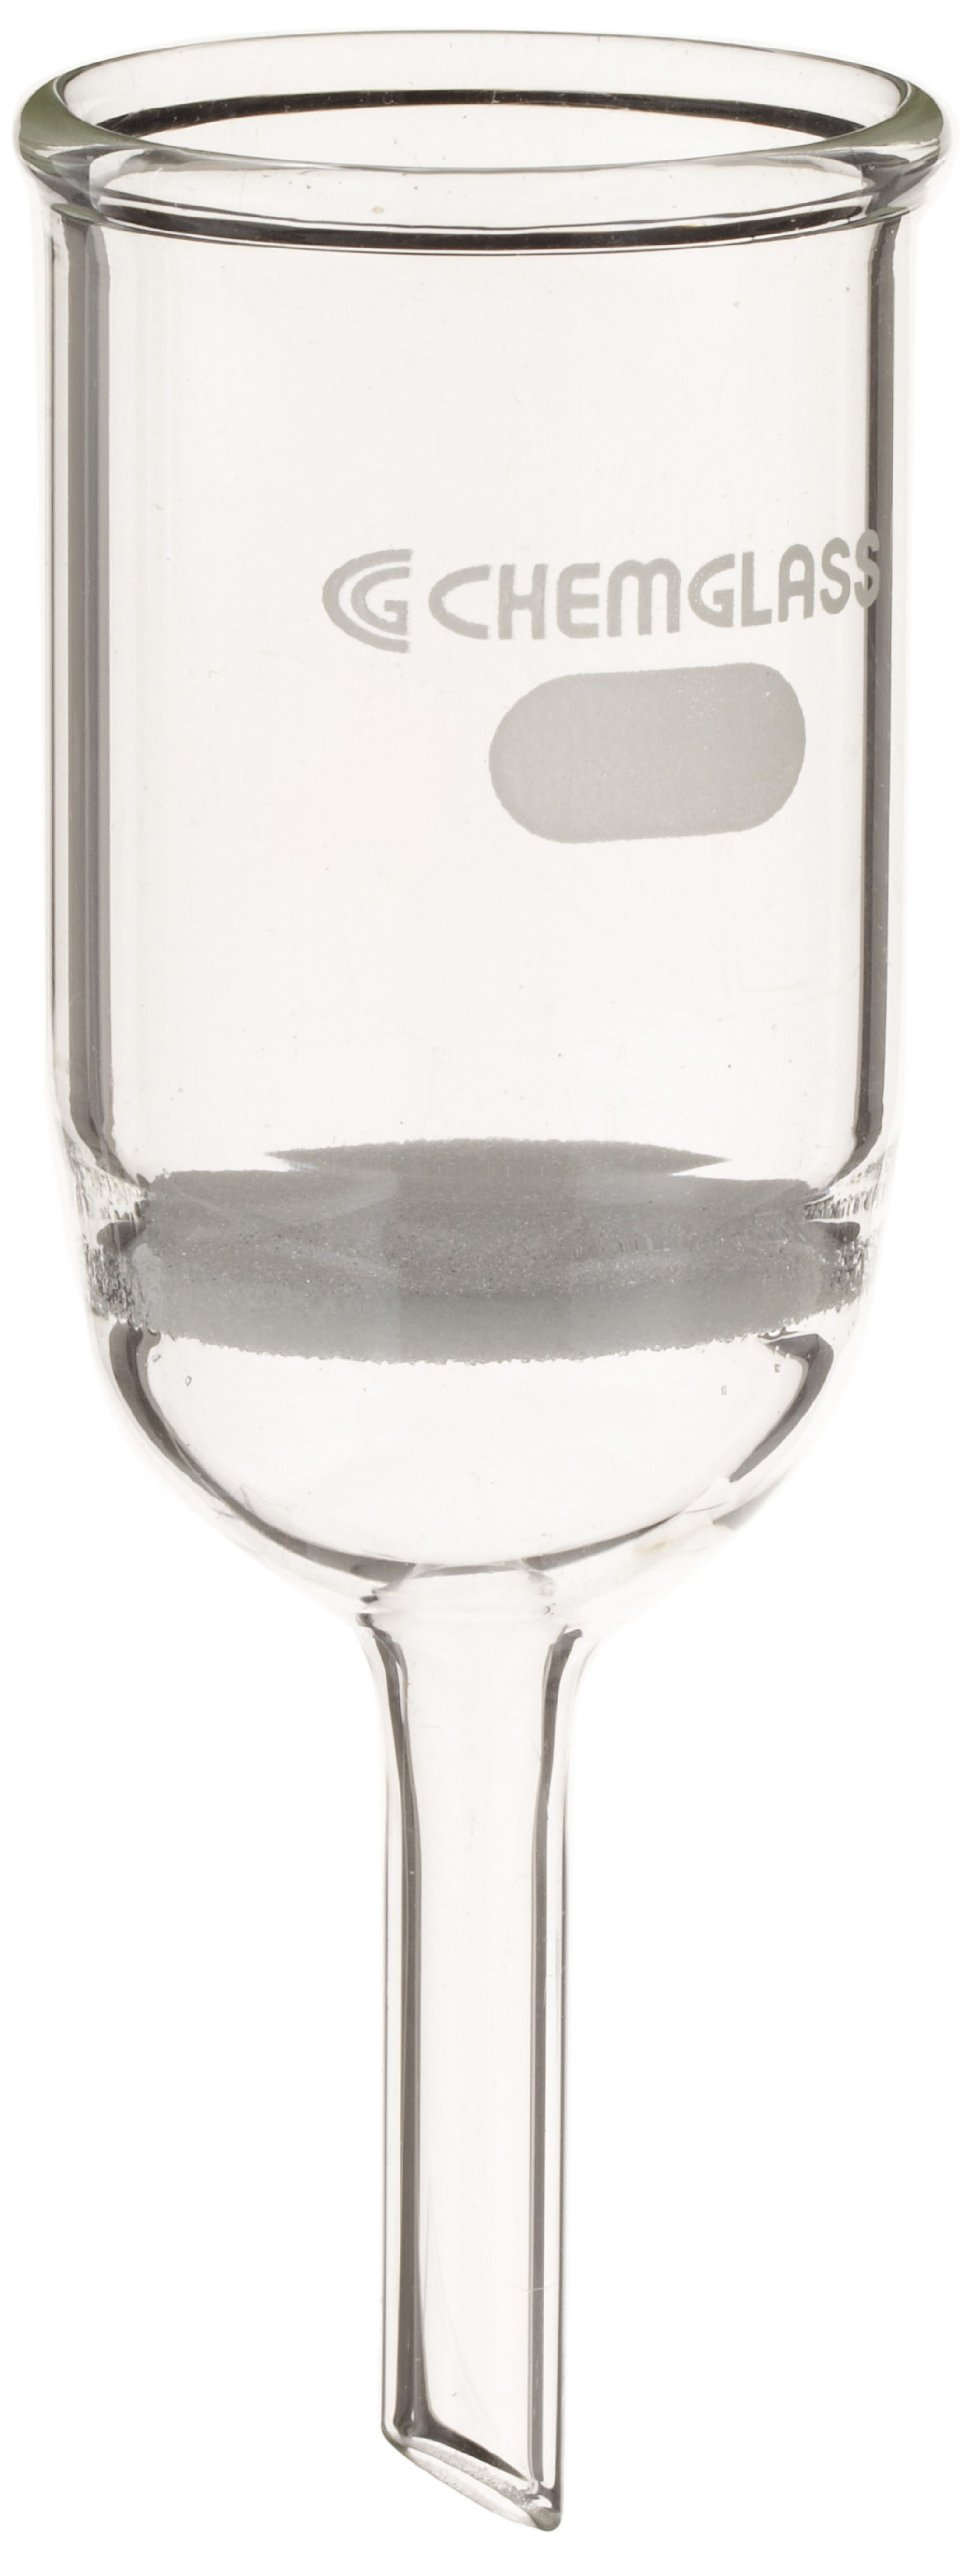 Chemglass CG-1402-10 Glass Buchner Filtering Funnel with Coarse Frit, 30mL Capacity, 8mm OD x 75mm Length Stem, 30mm Diameter